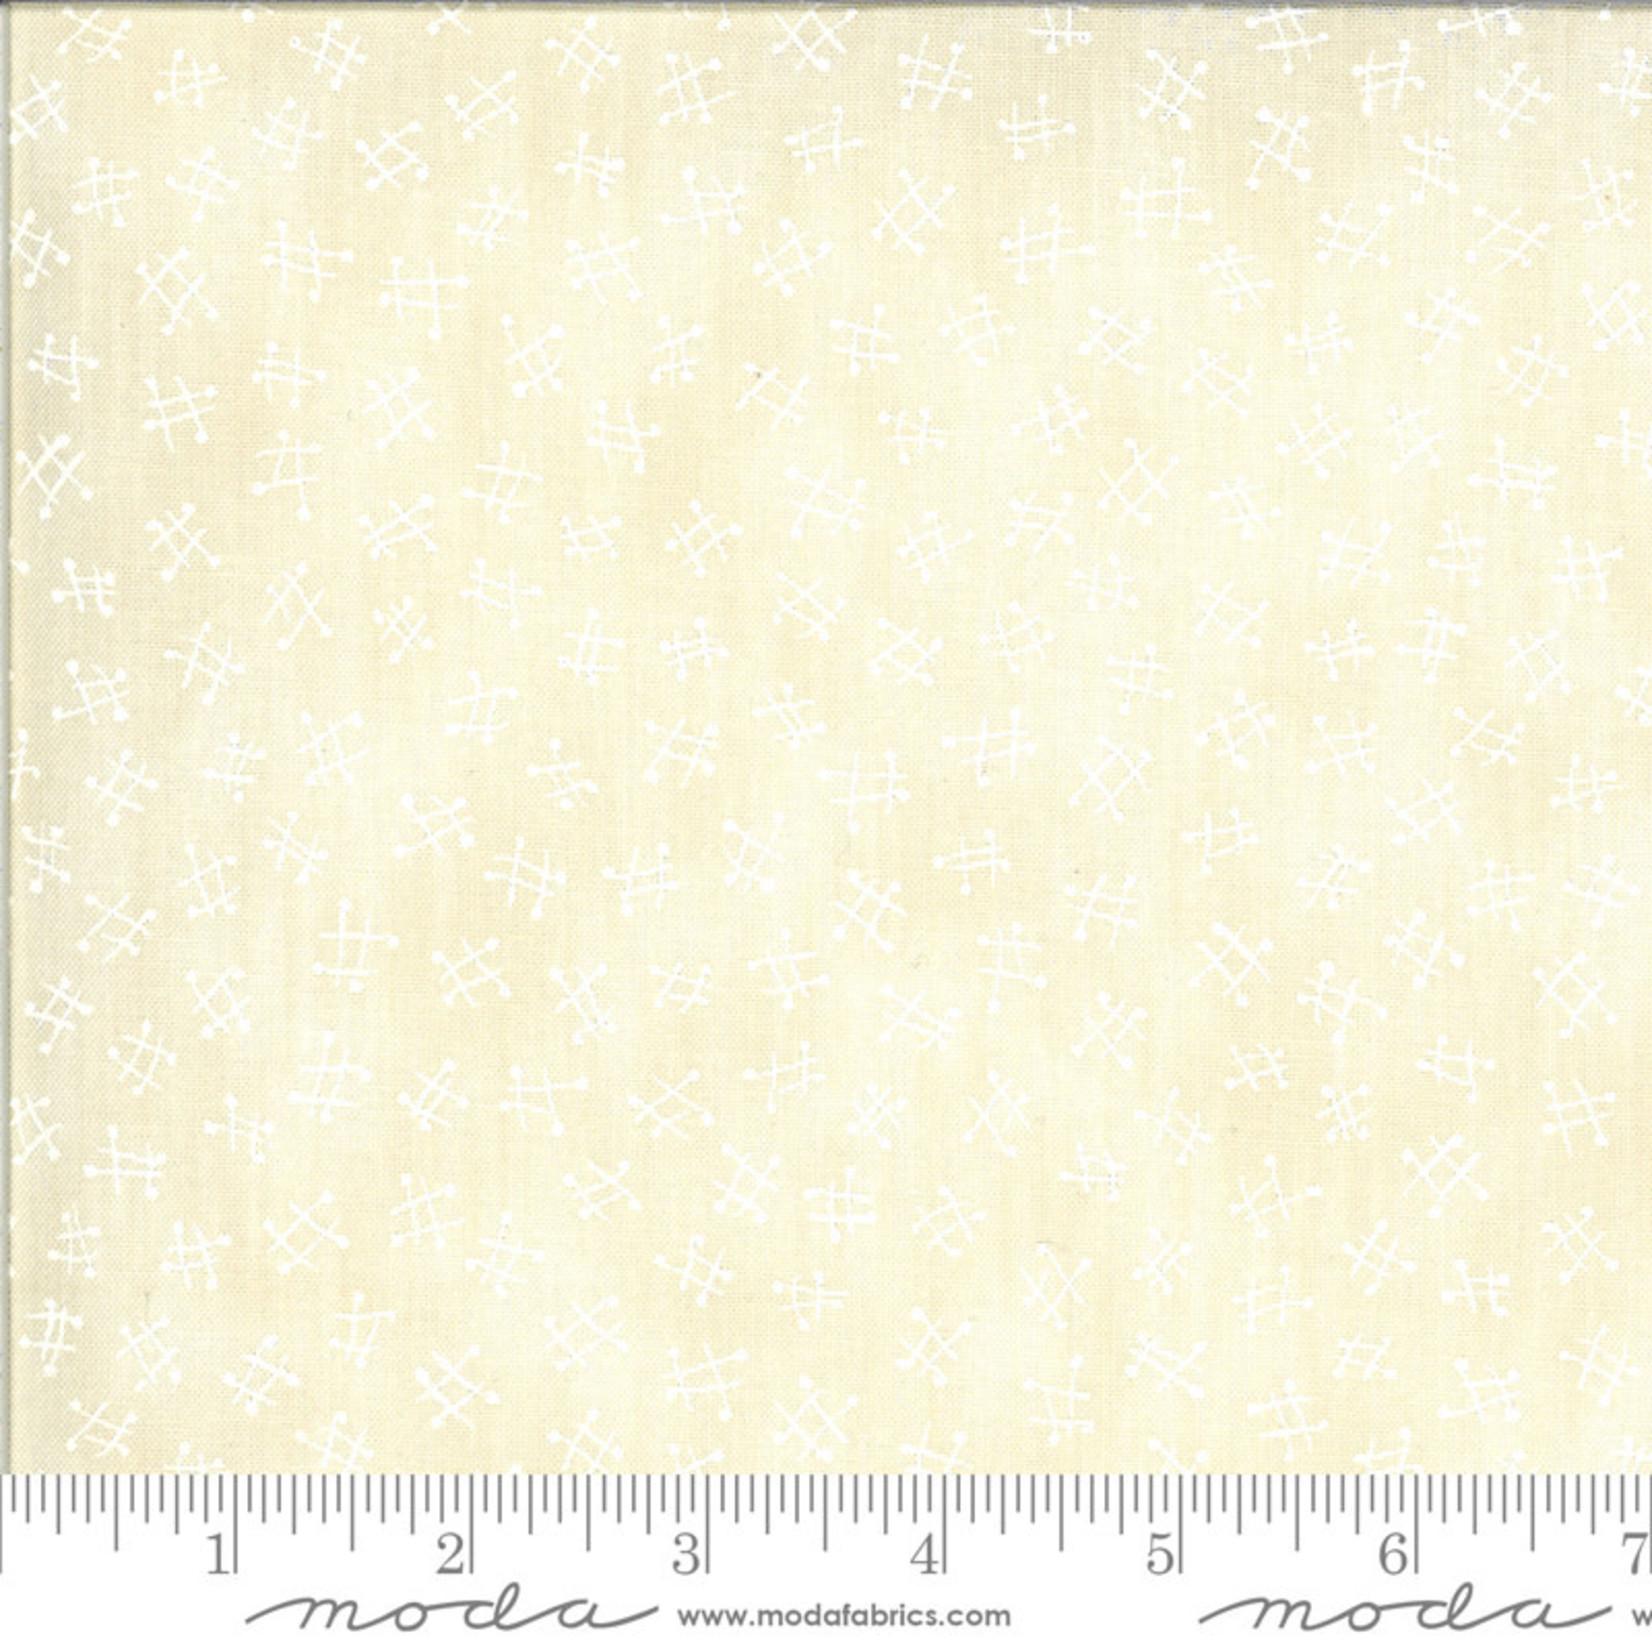 Moda THE BLUES, CROCHET TONAL, BILLIE (16901-11) $0.21 PER CM OR $21/M